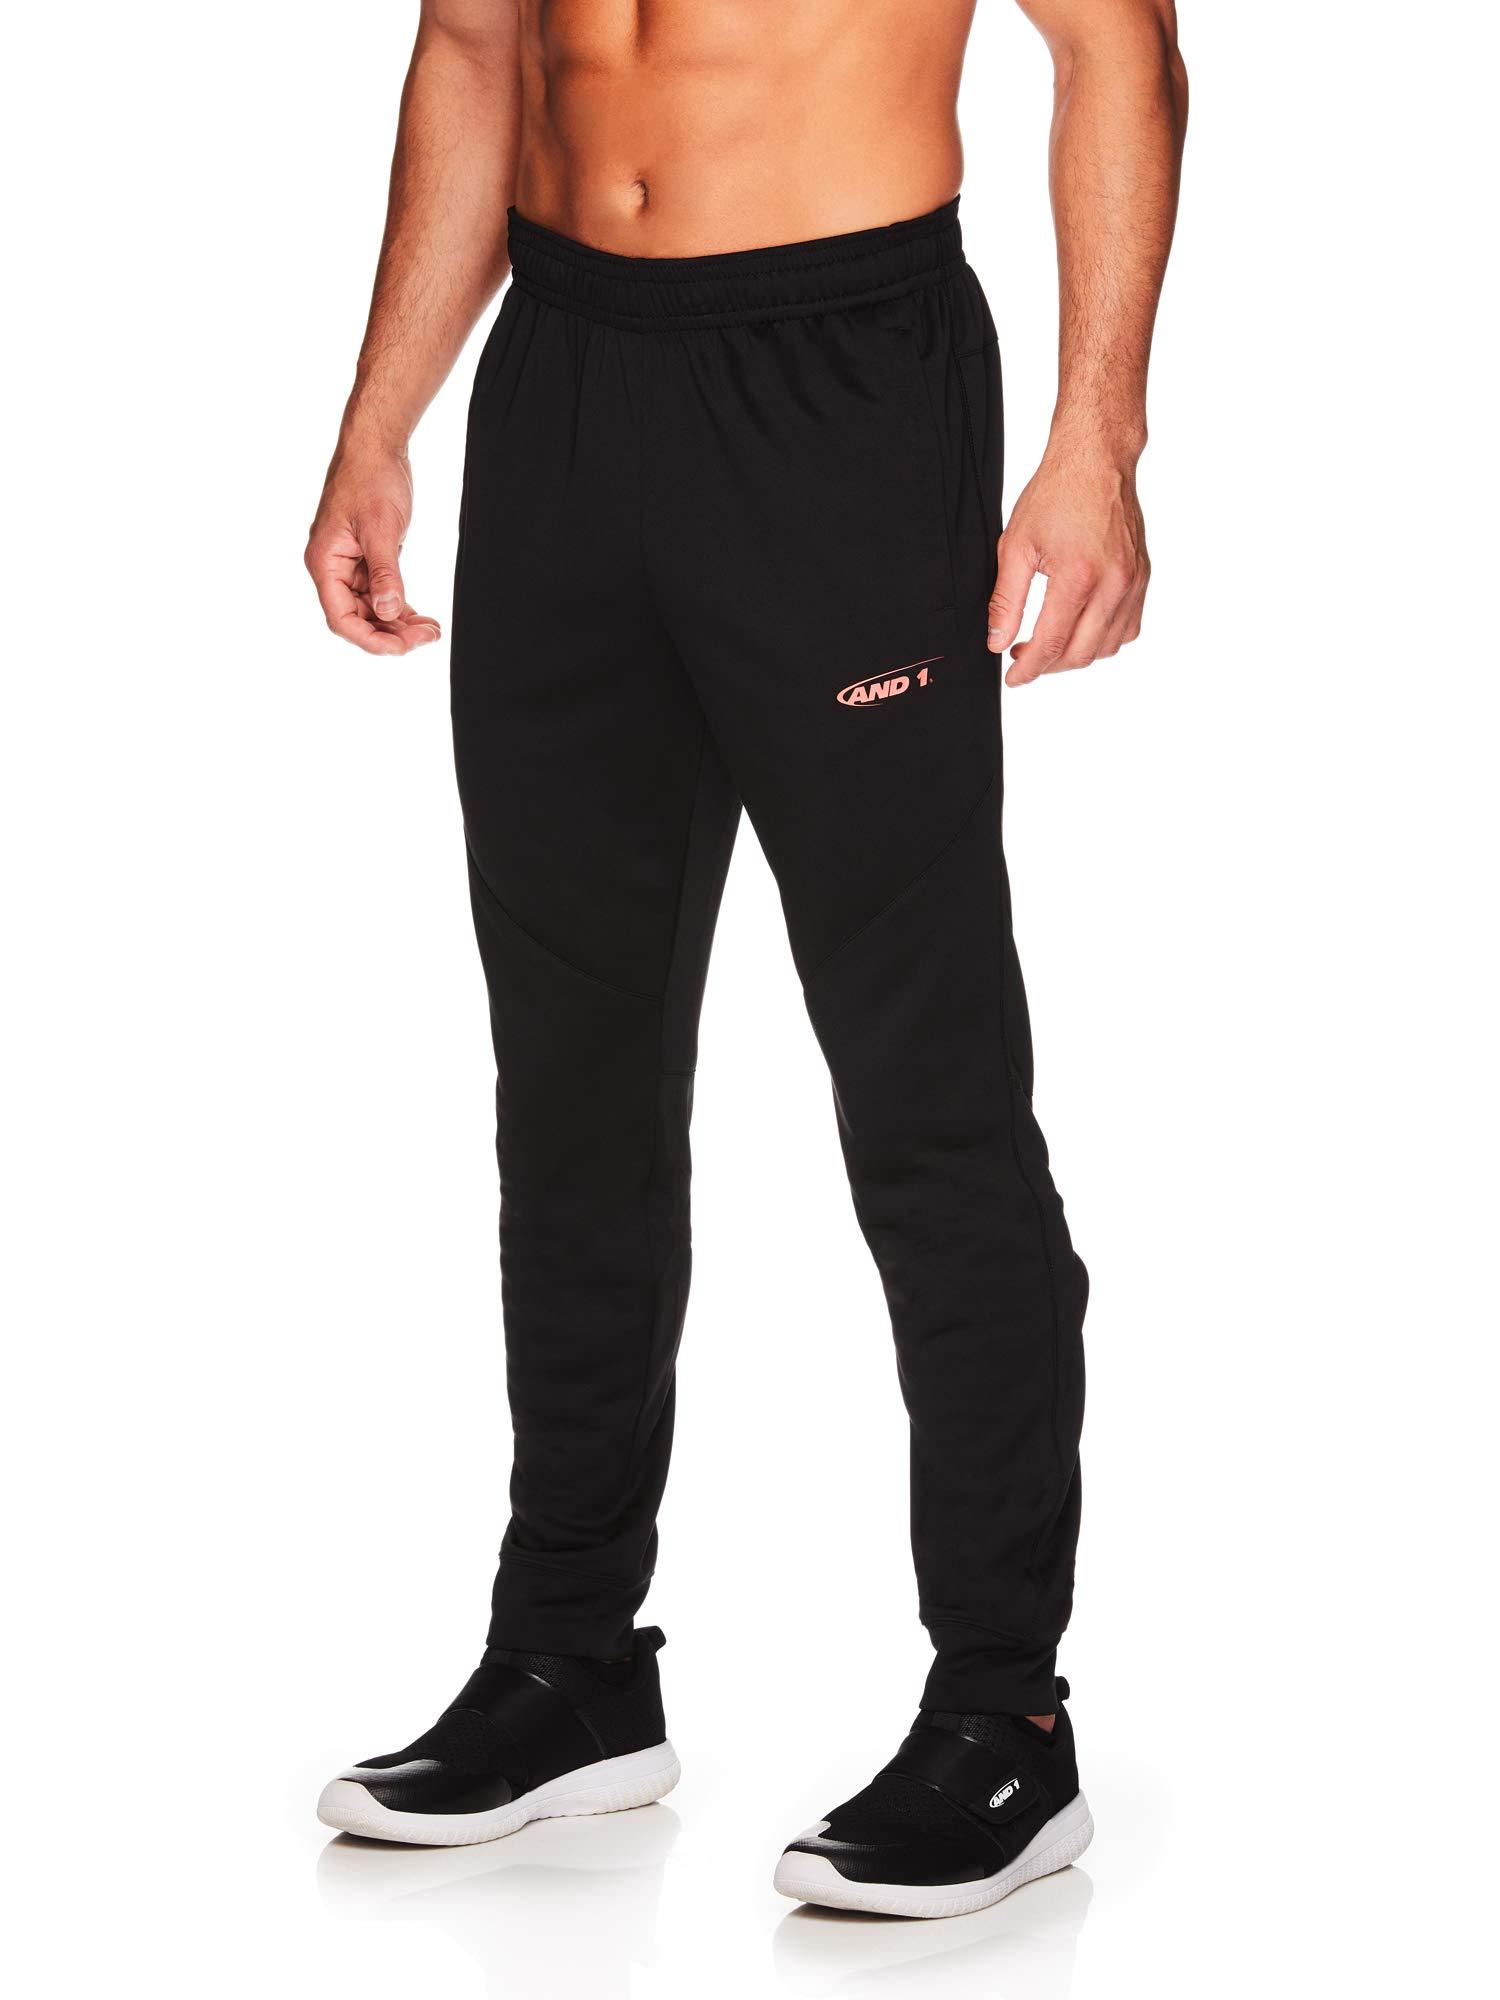 AND1 Men's Tricot Jogger Pants - Basketball Running & Jogging Sweatpants w/Pockets - Black/Hot Coral, Small